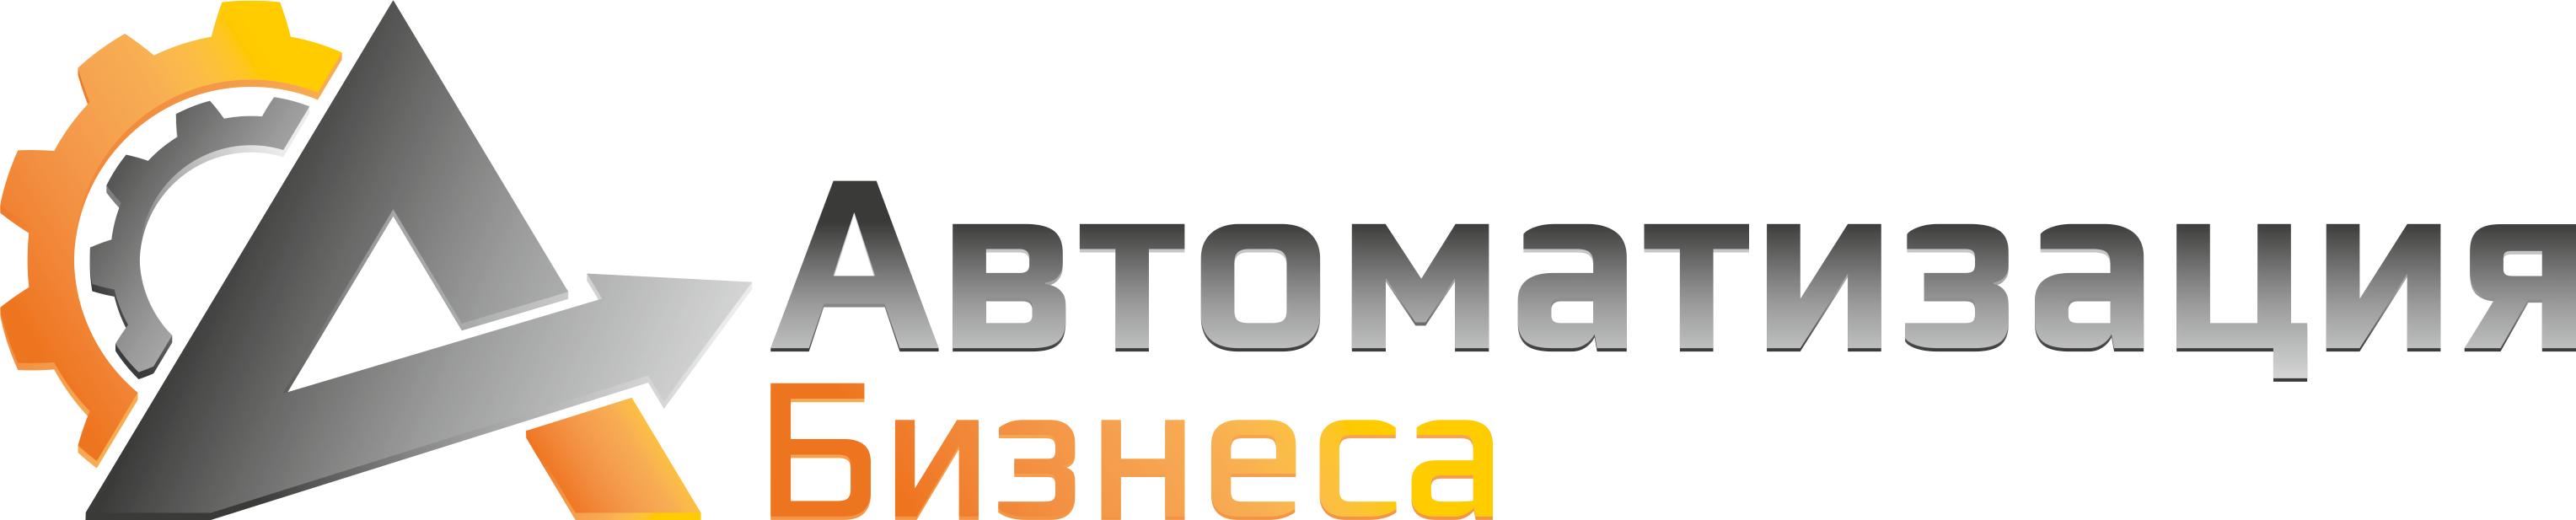 ООО Автоматизация